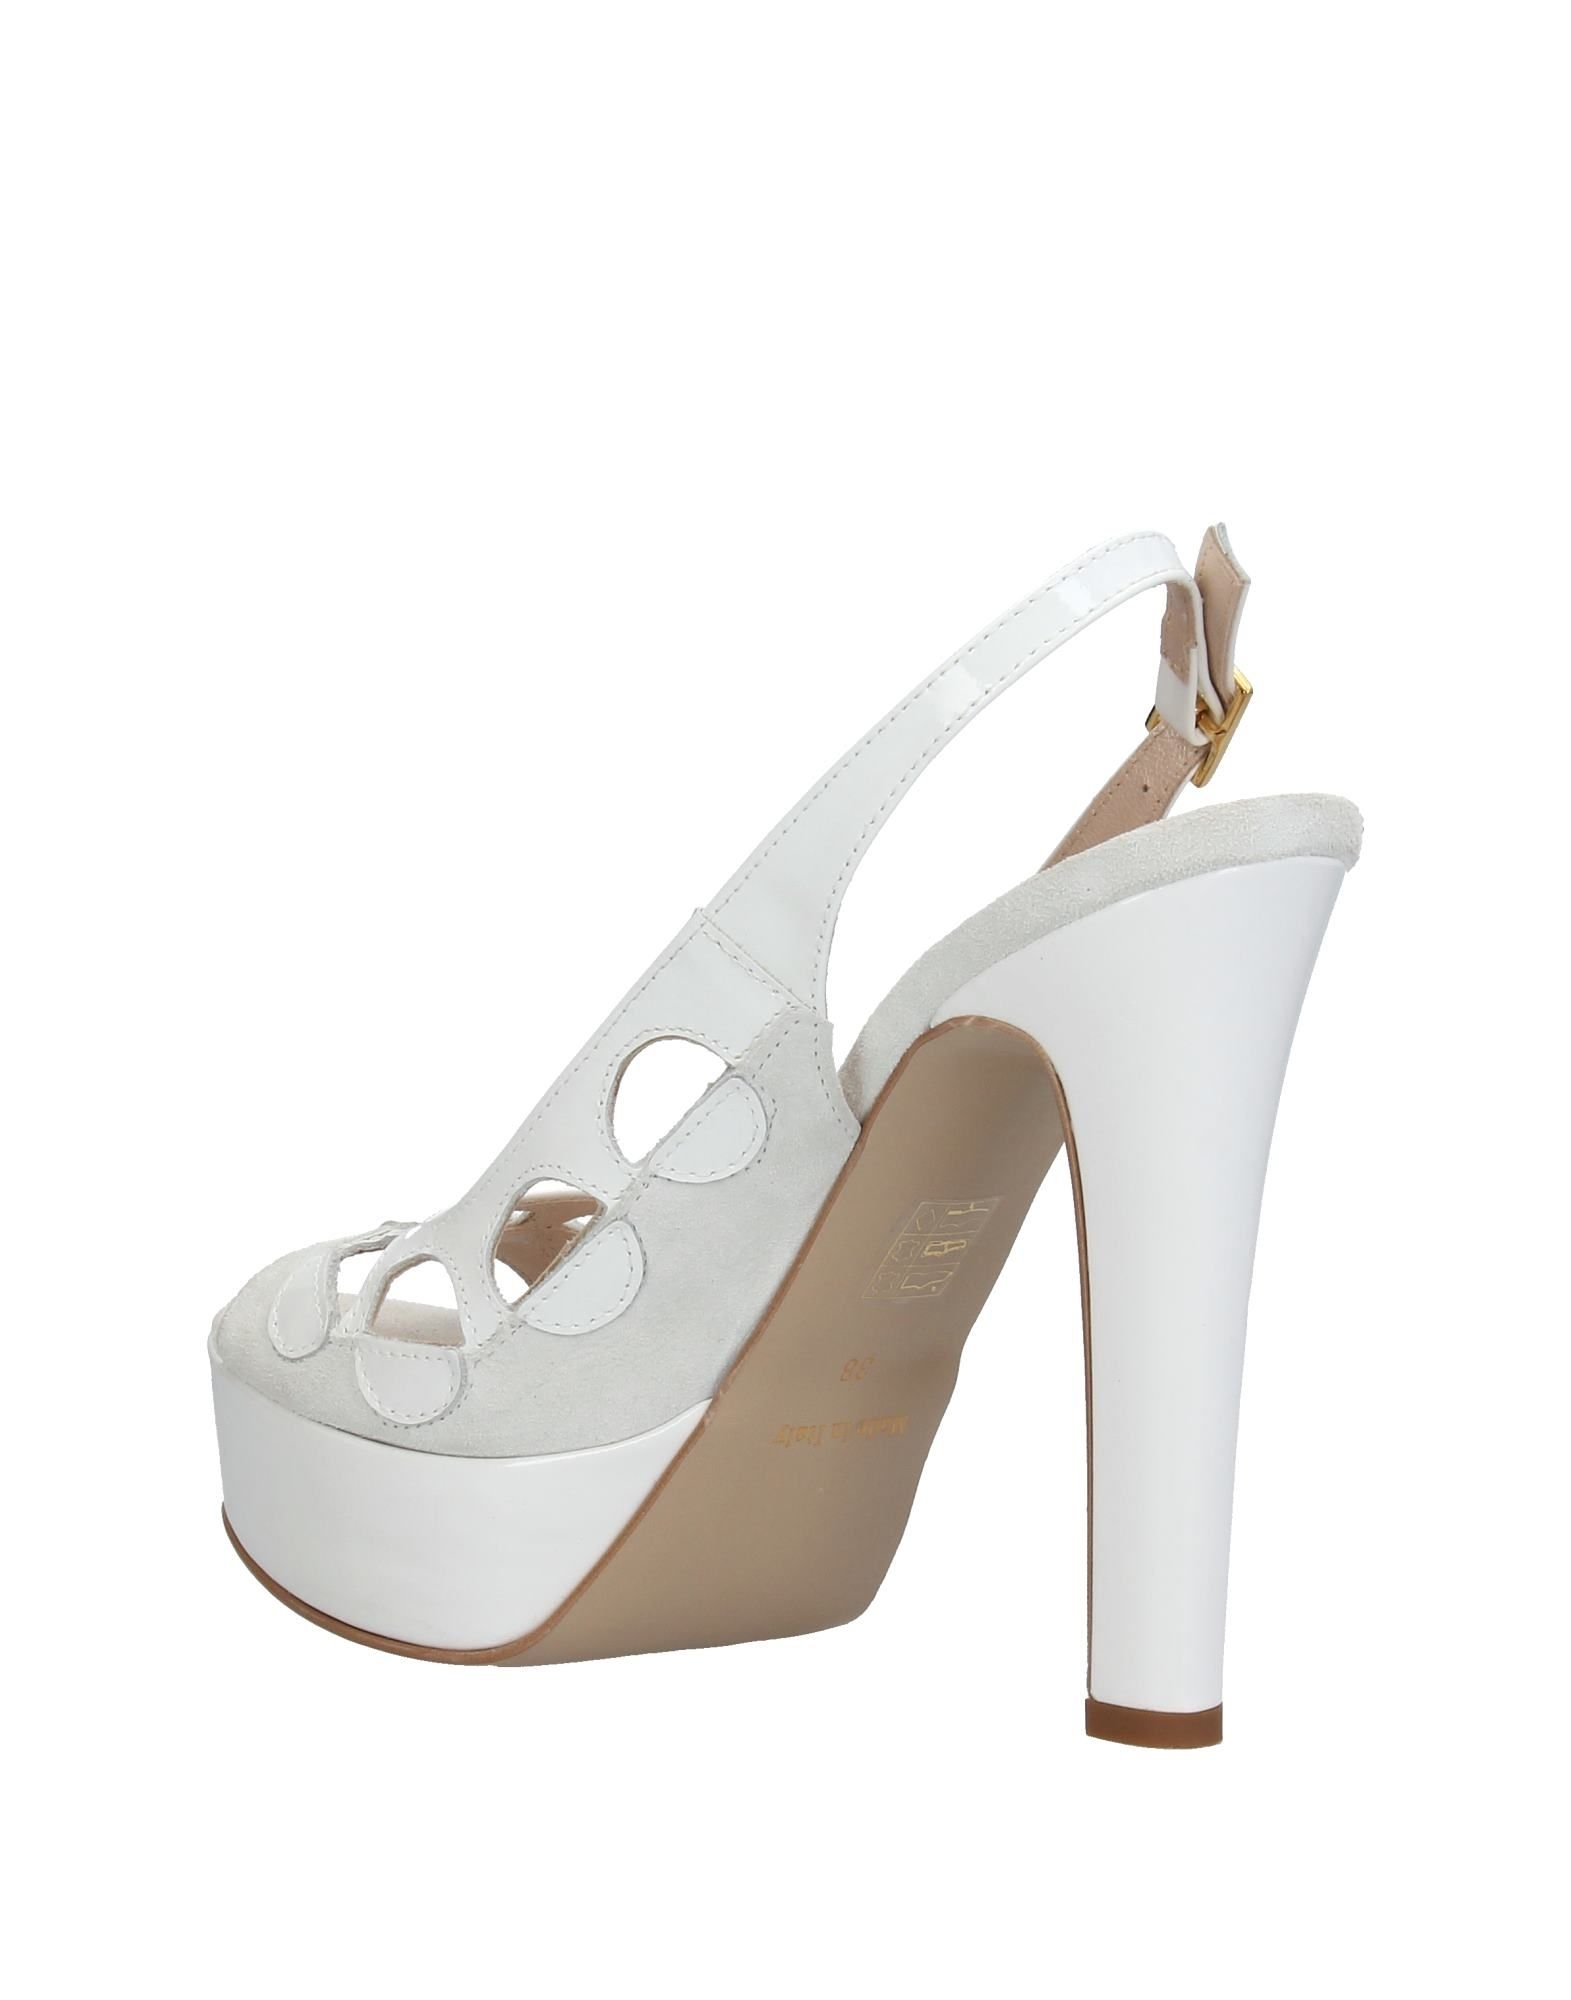 Sandales La Via Del Mare Femme - Sandales La Via Del Mare sur